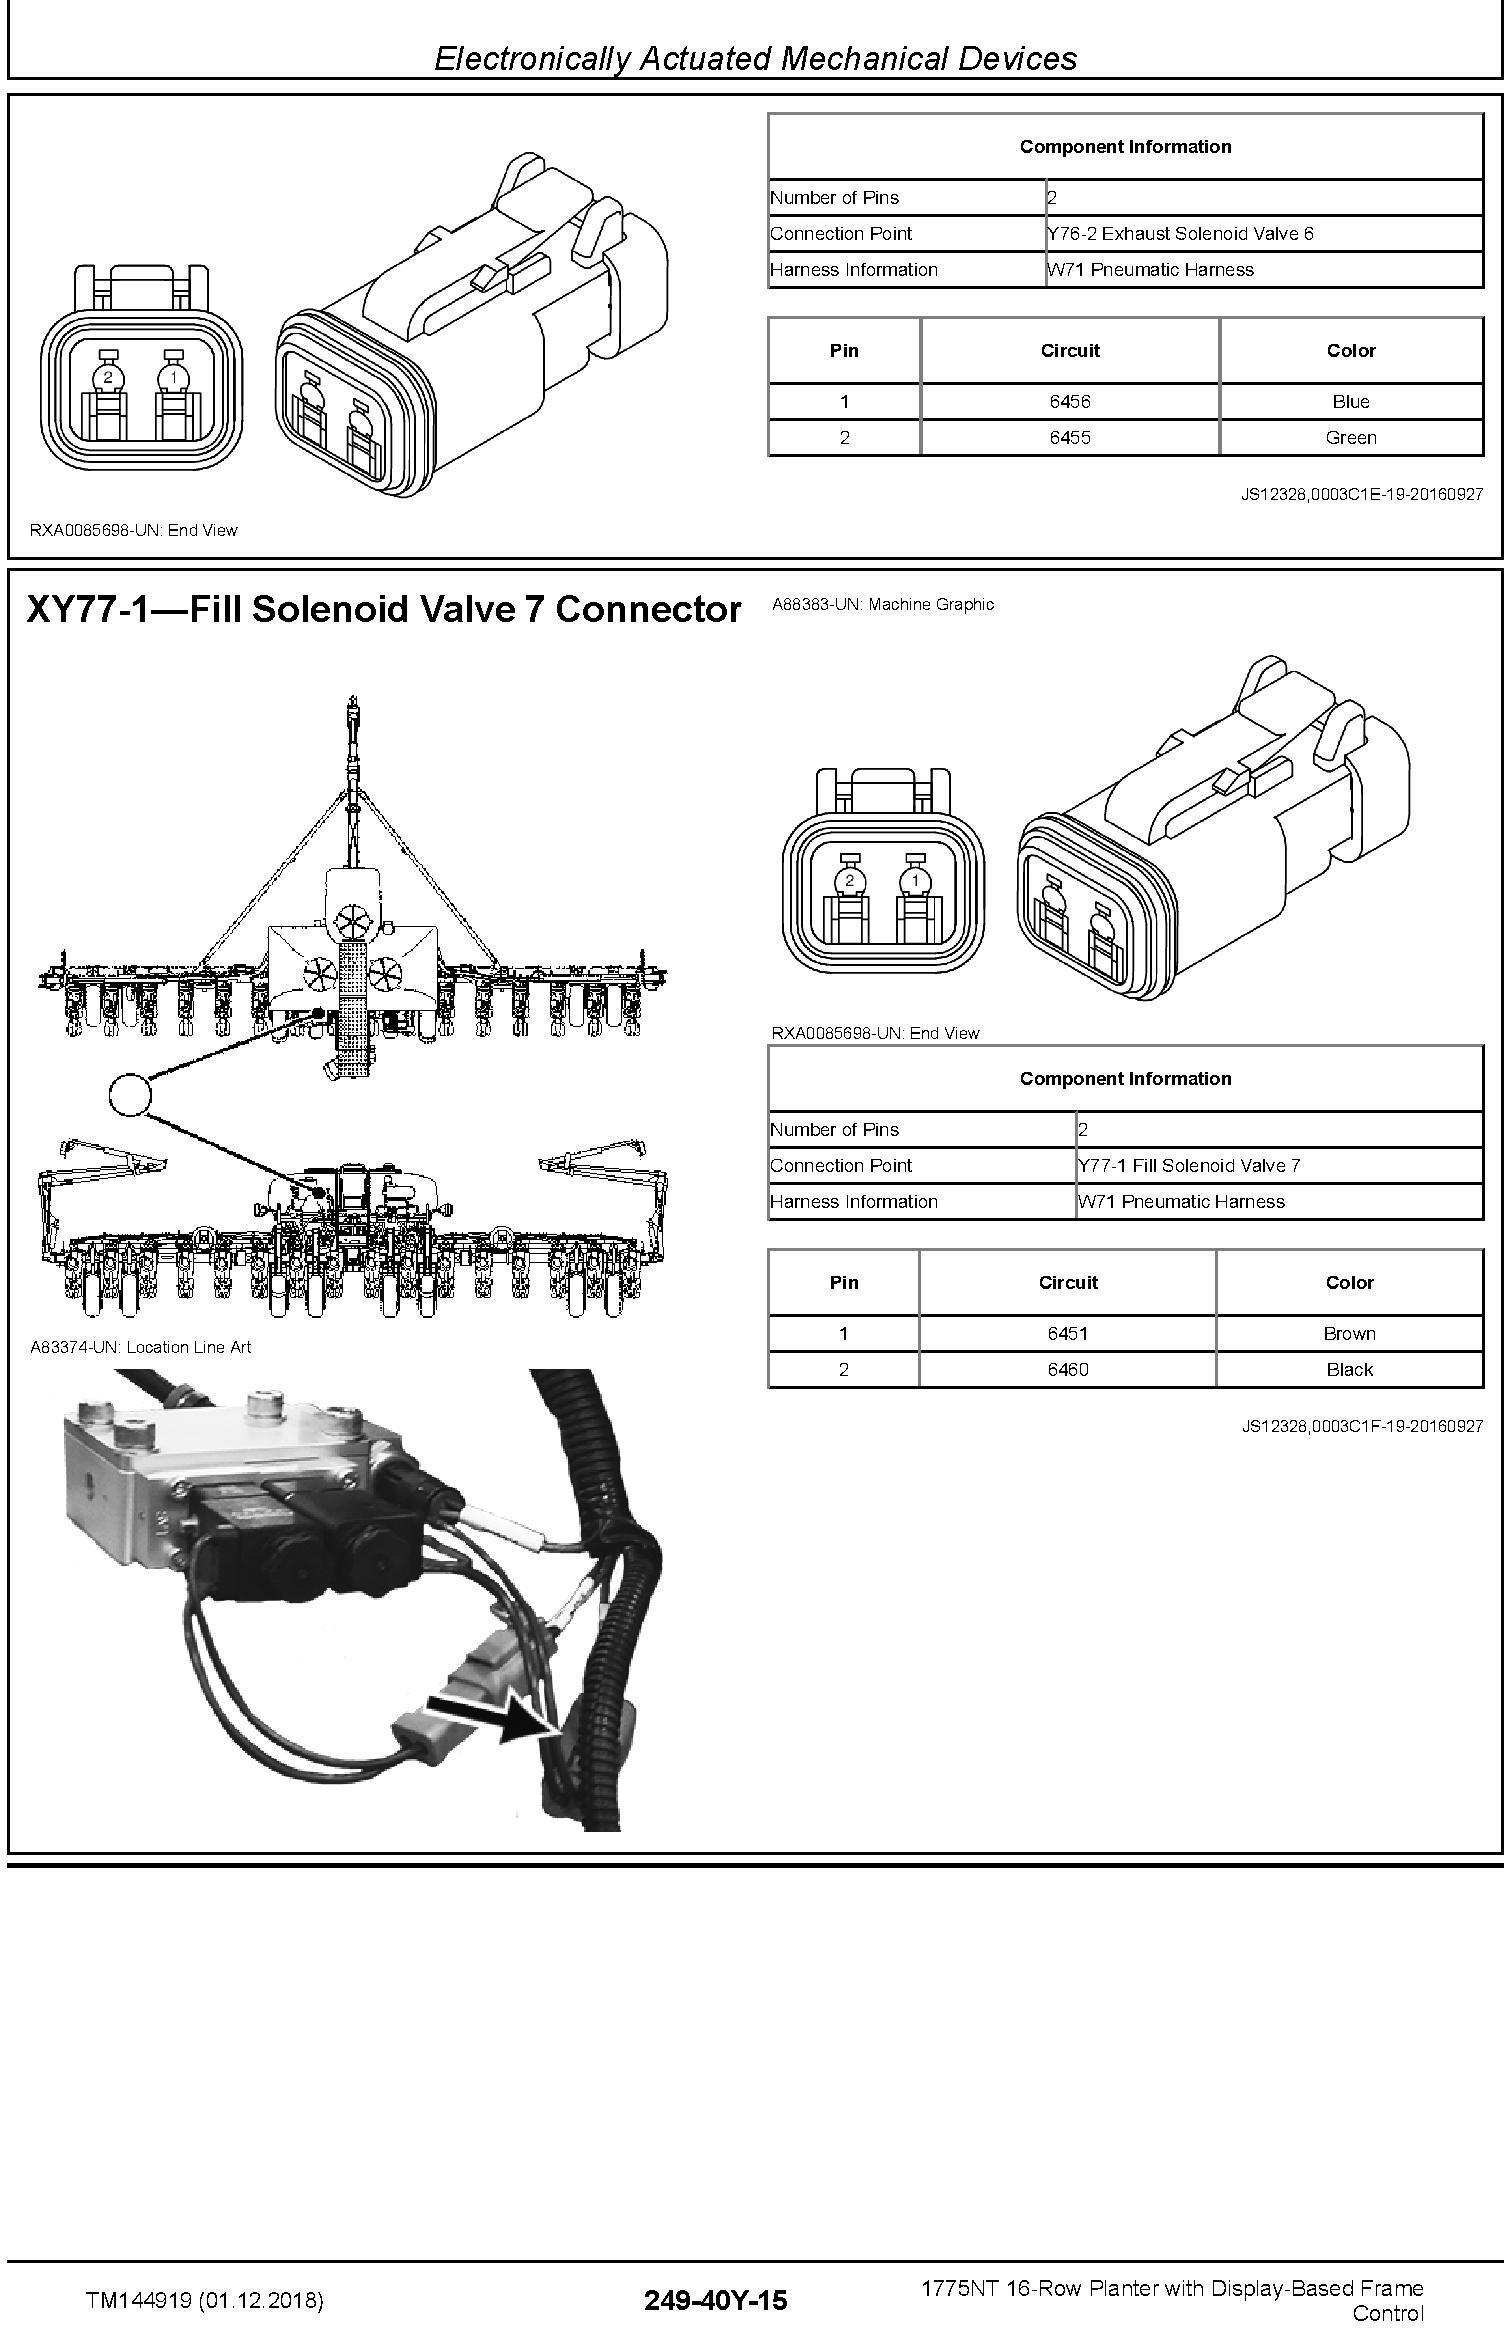 John Deere 1775NT 16row Planter w.Display-Based Frame Control Diagnostic Technical Manual (TM144919) - 3